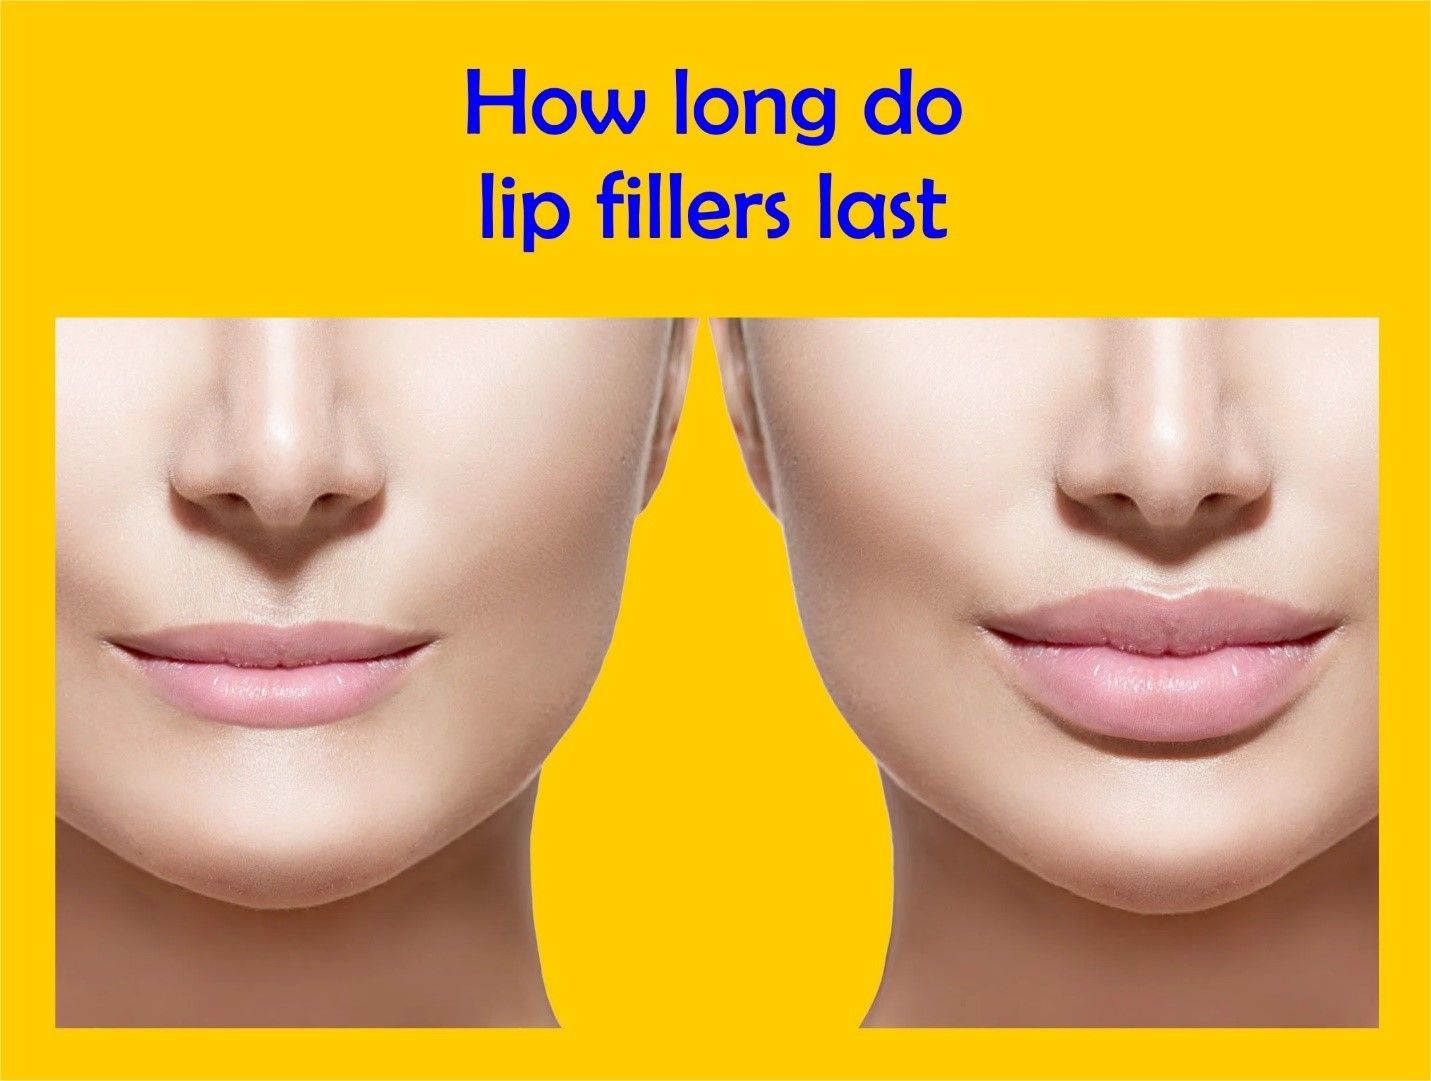 How long do lips fillers last